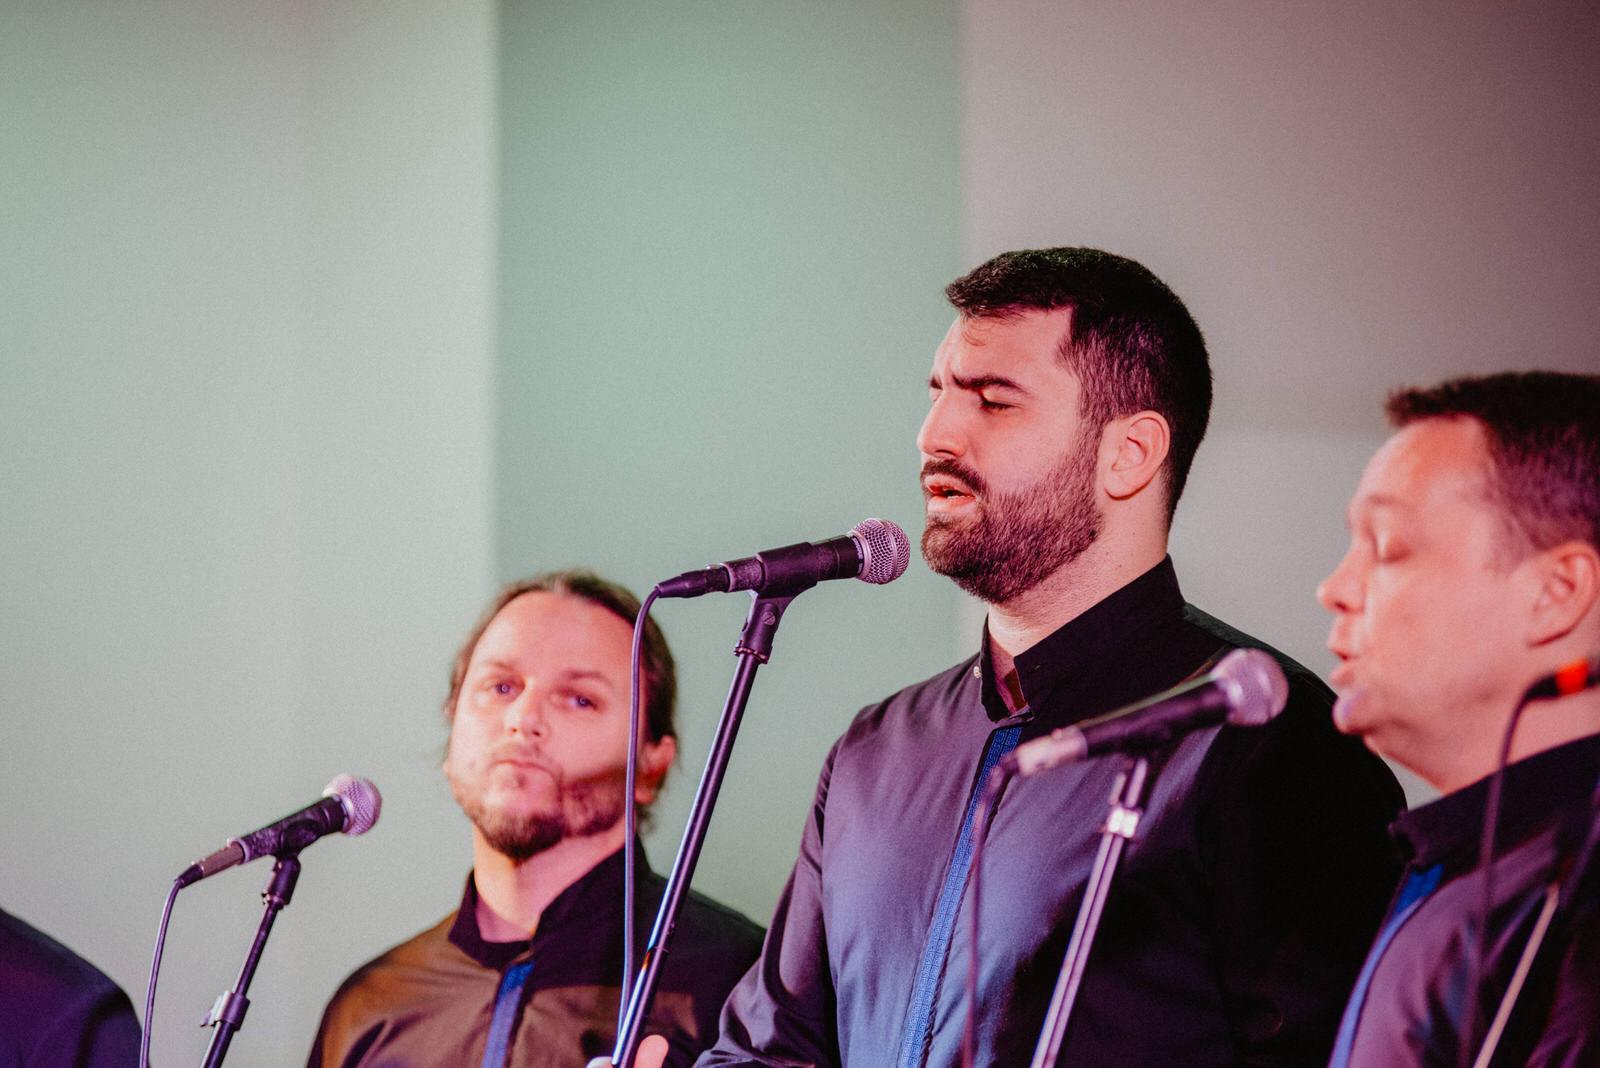 likaclub_koncert-klapa-cambi_kic-gospić_2019-10